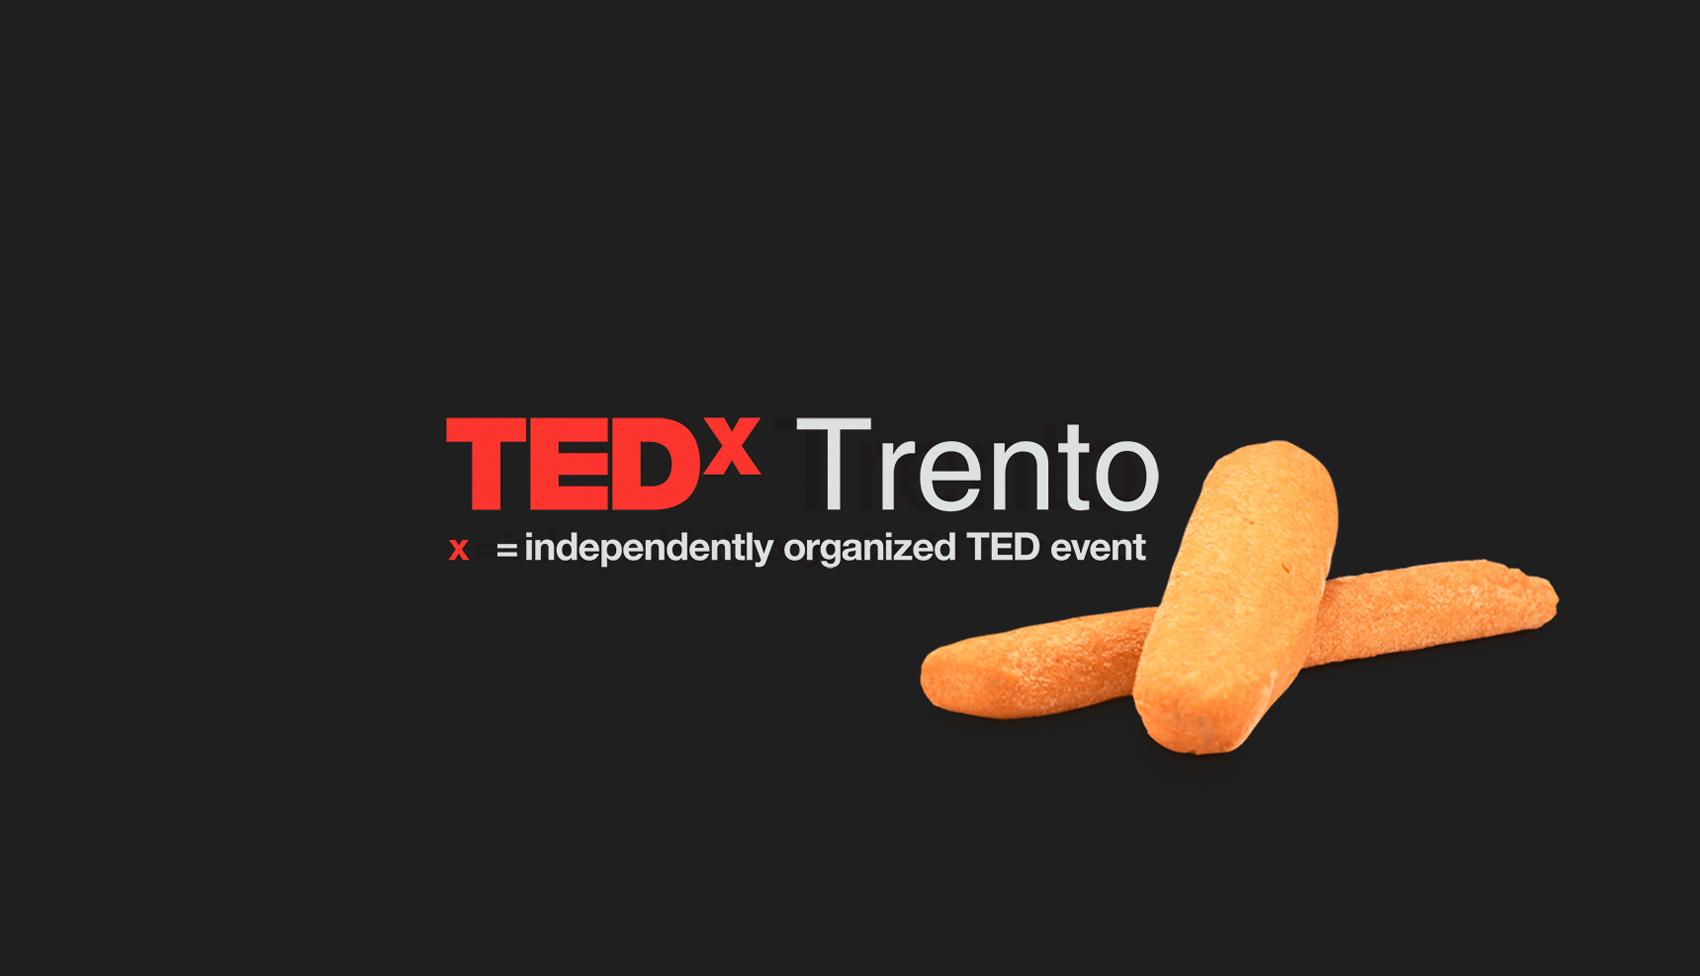 Panificio Zorzi sponsor di TEDx Trento 2018